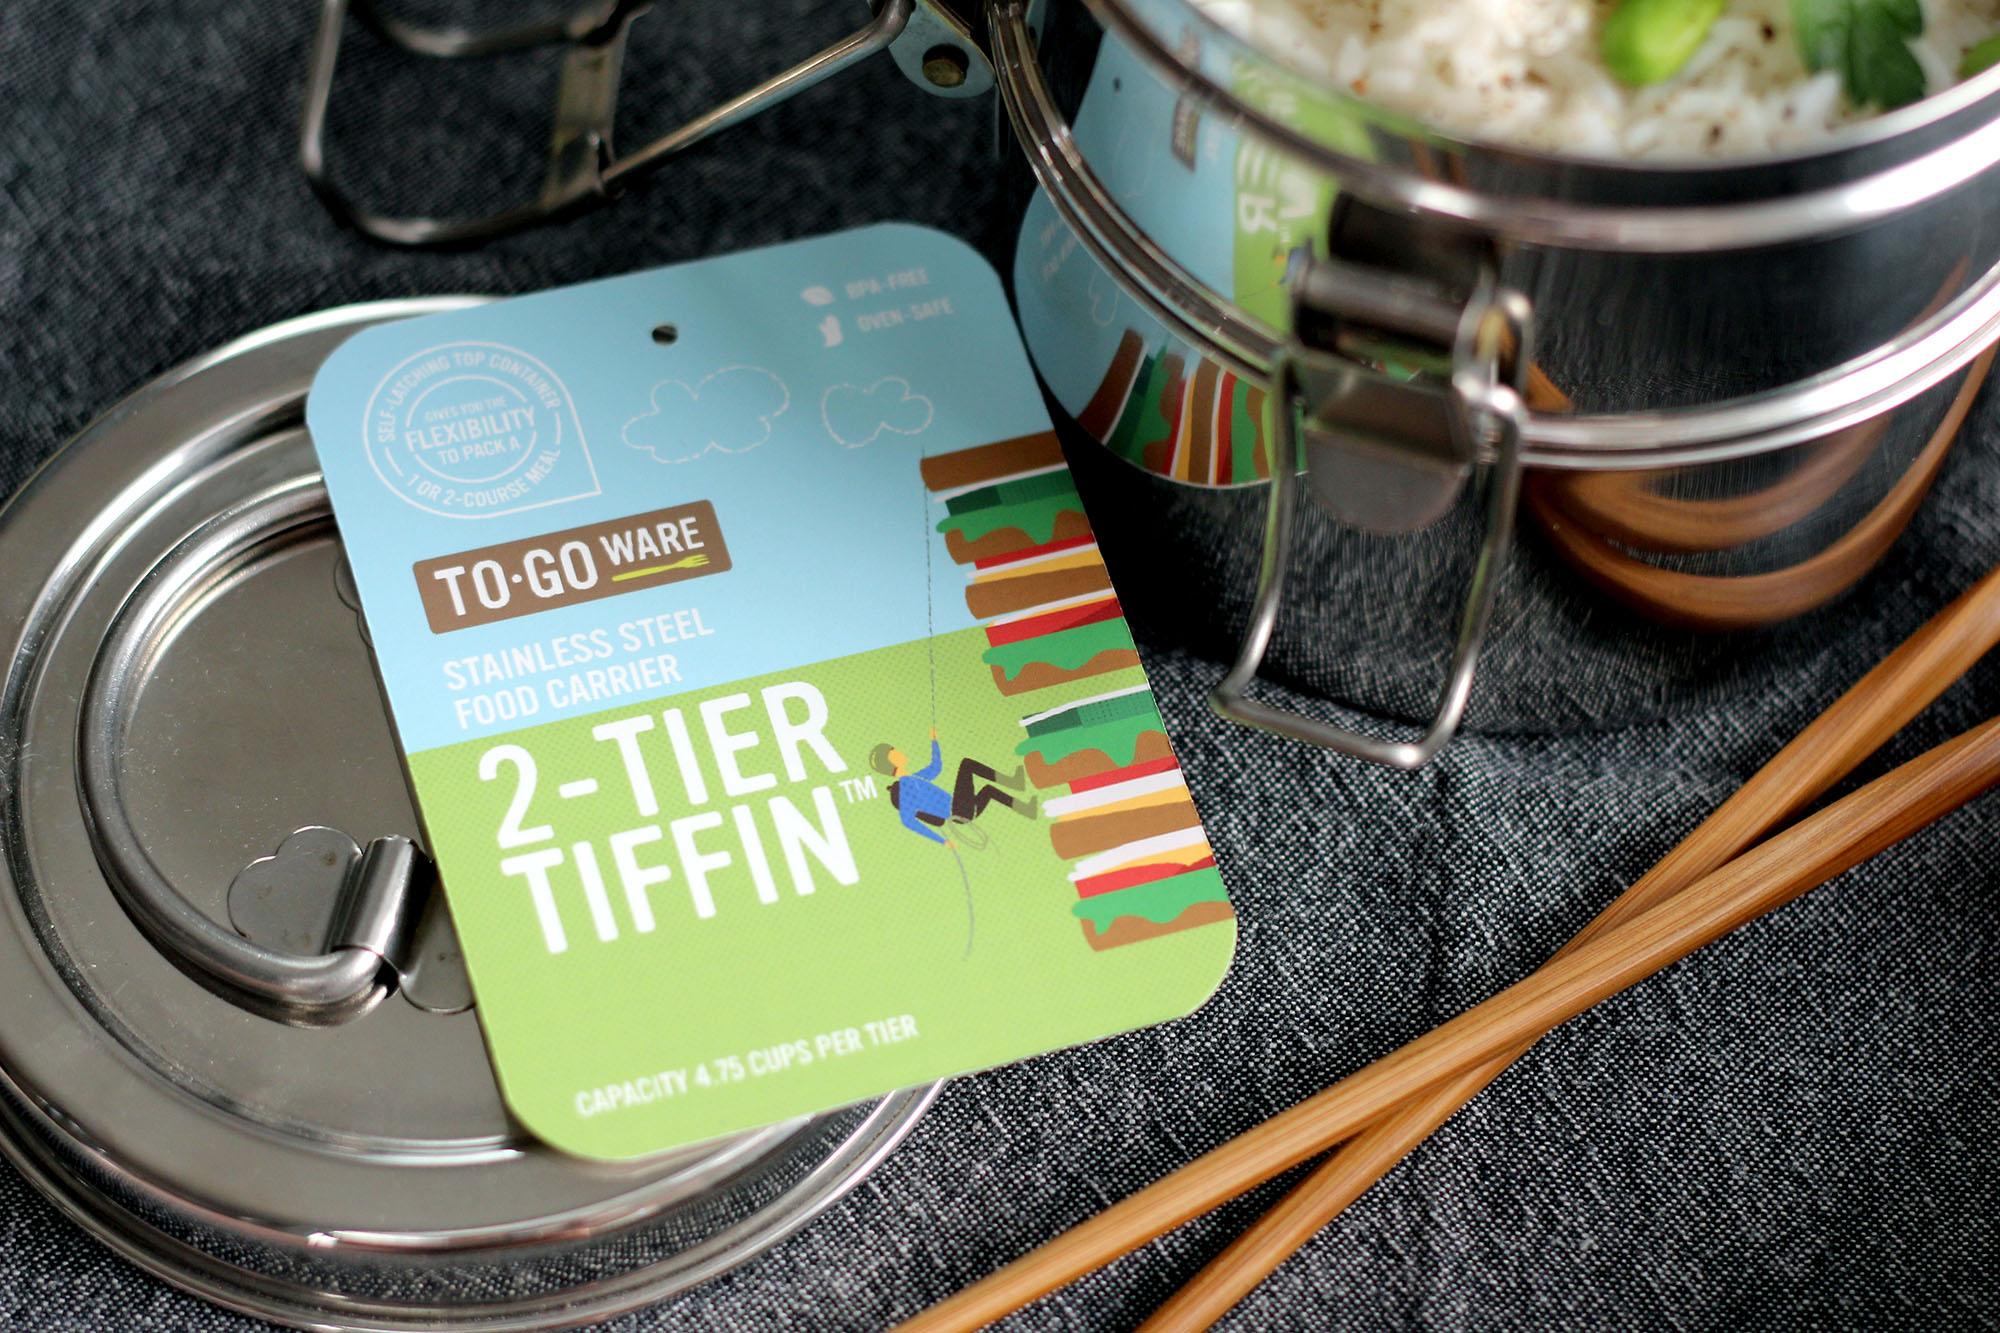 Branding - To-Go Ware Tiffin